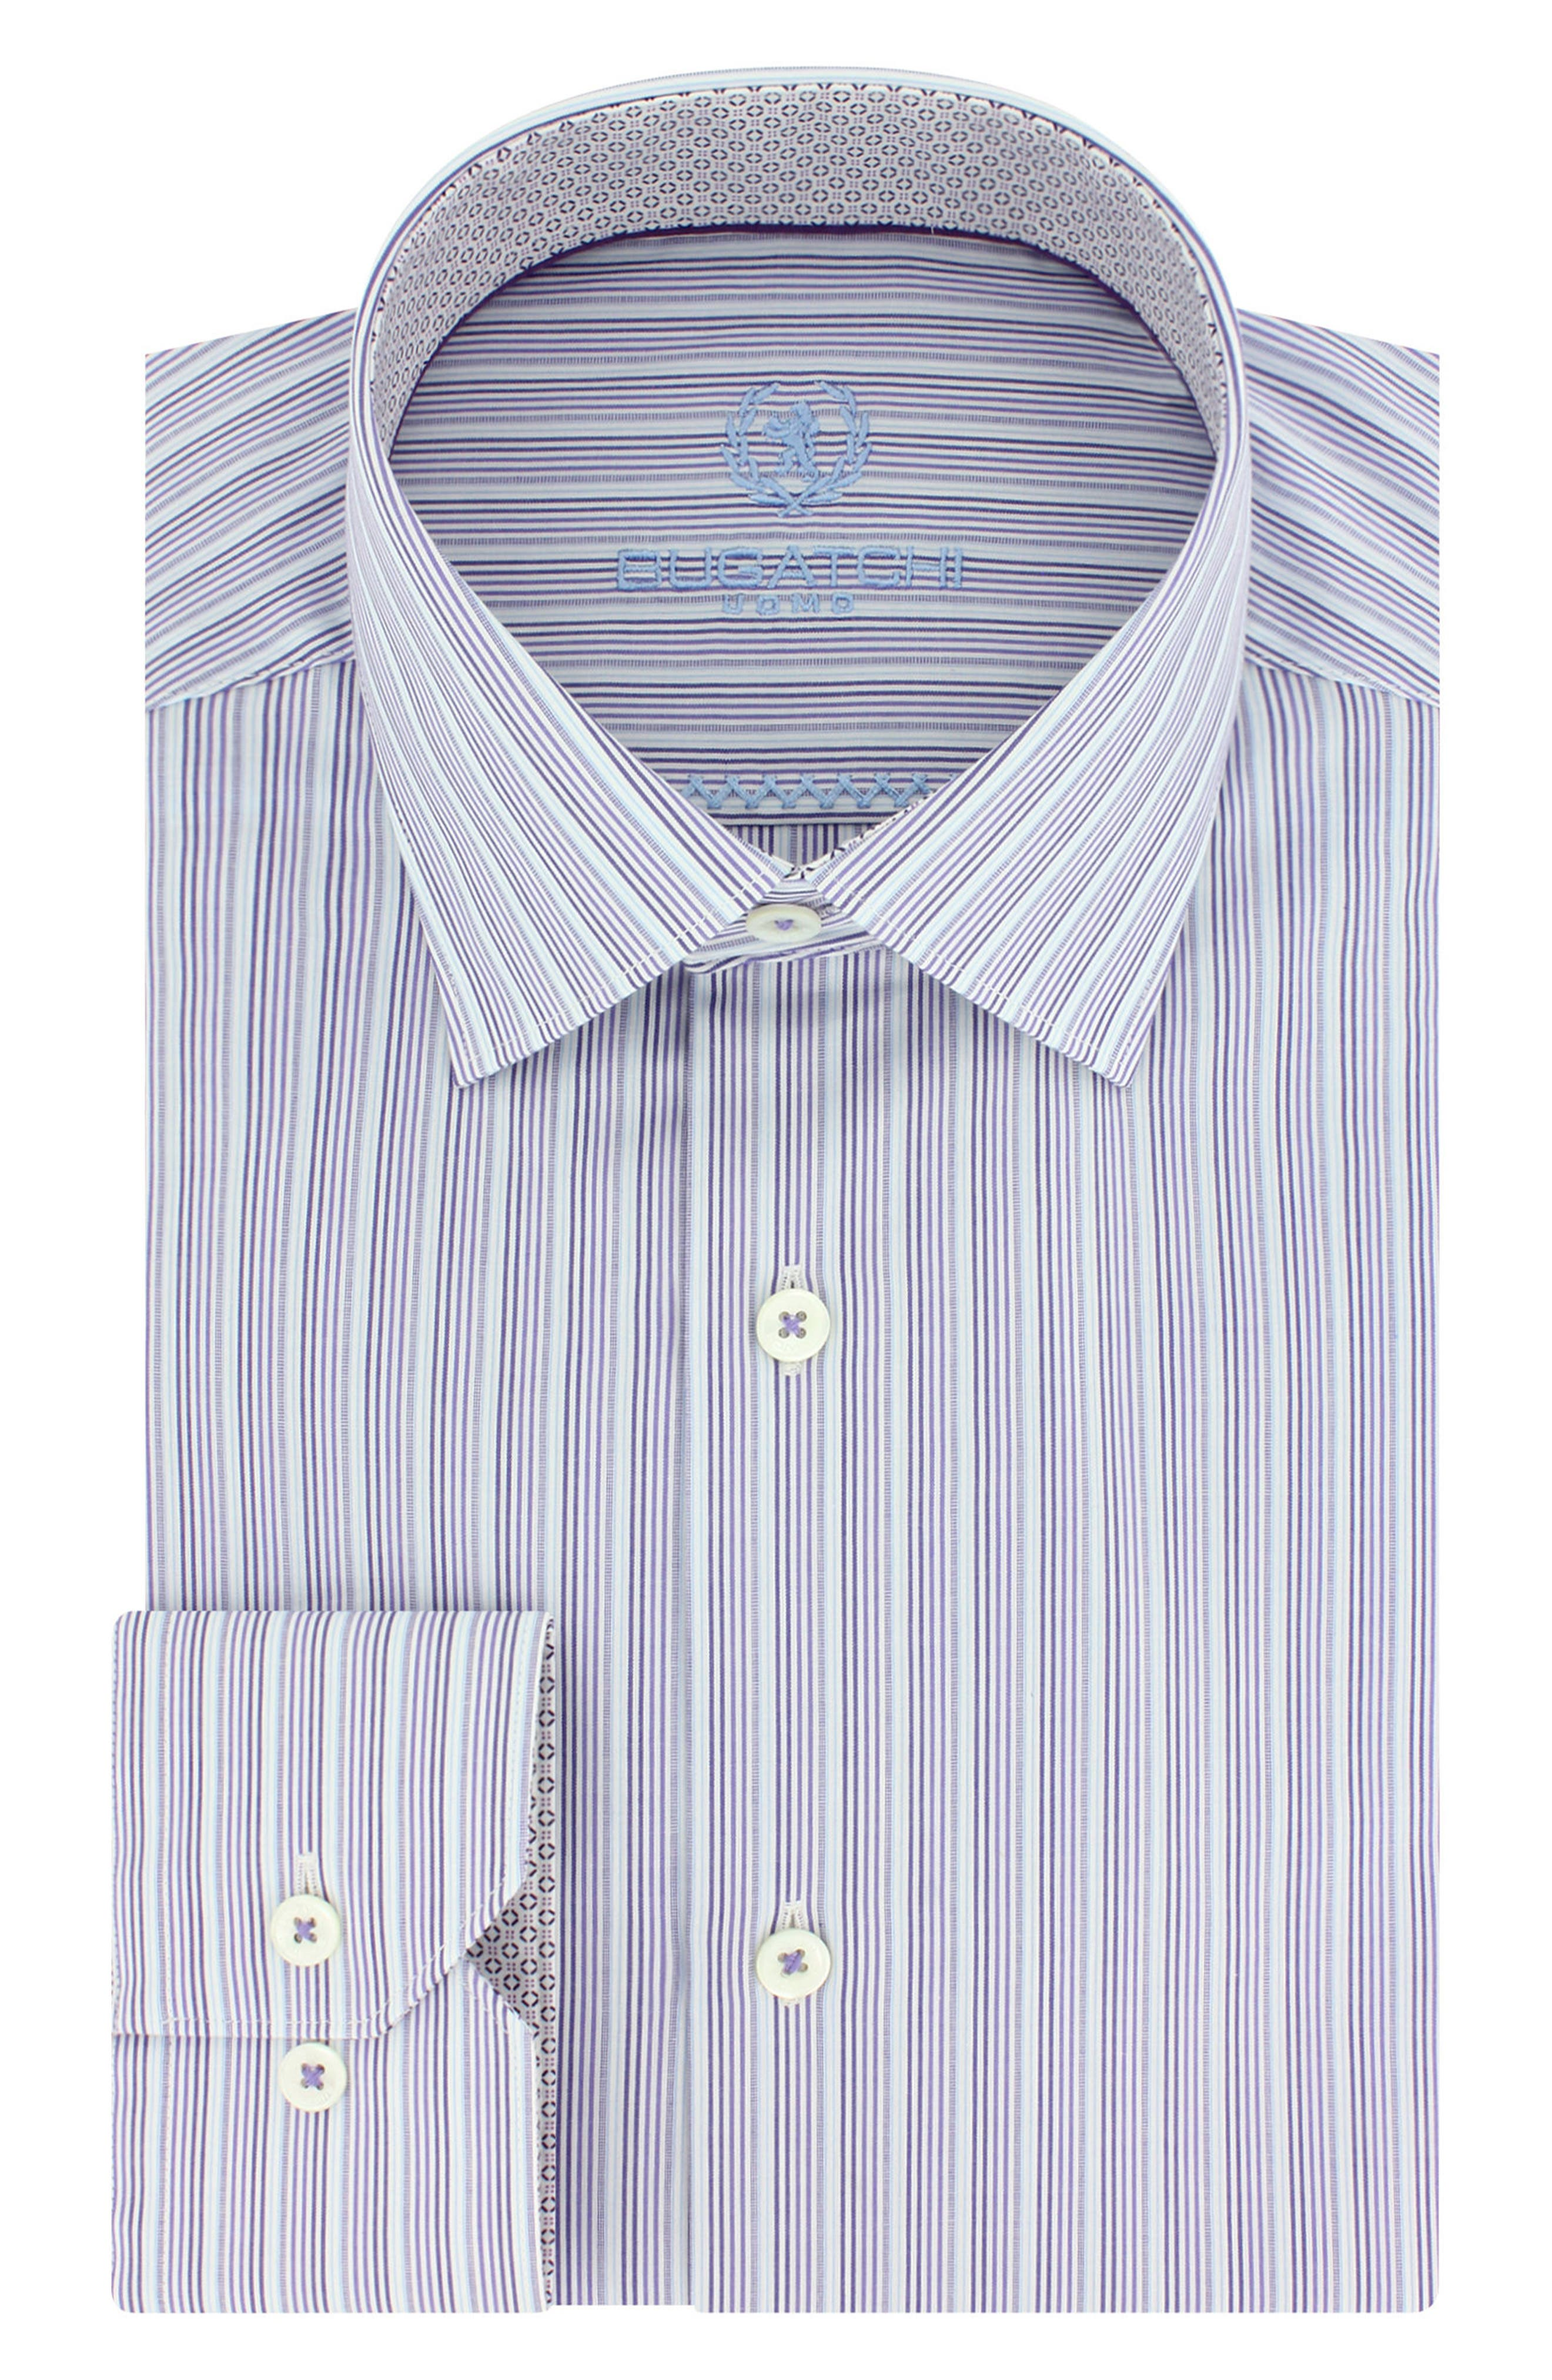 Alternate Image 1 Selected - Bugatchi Trim Fit Stripe Dress Shirt